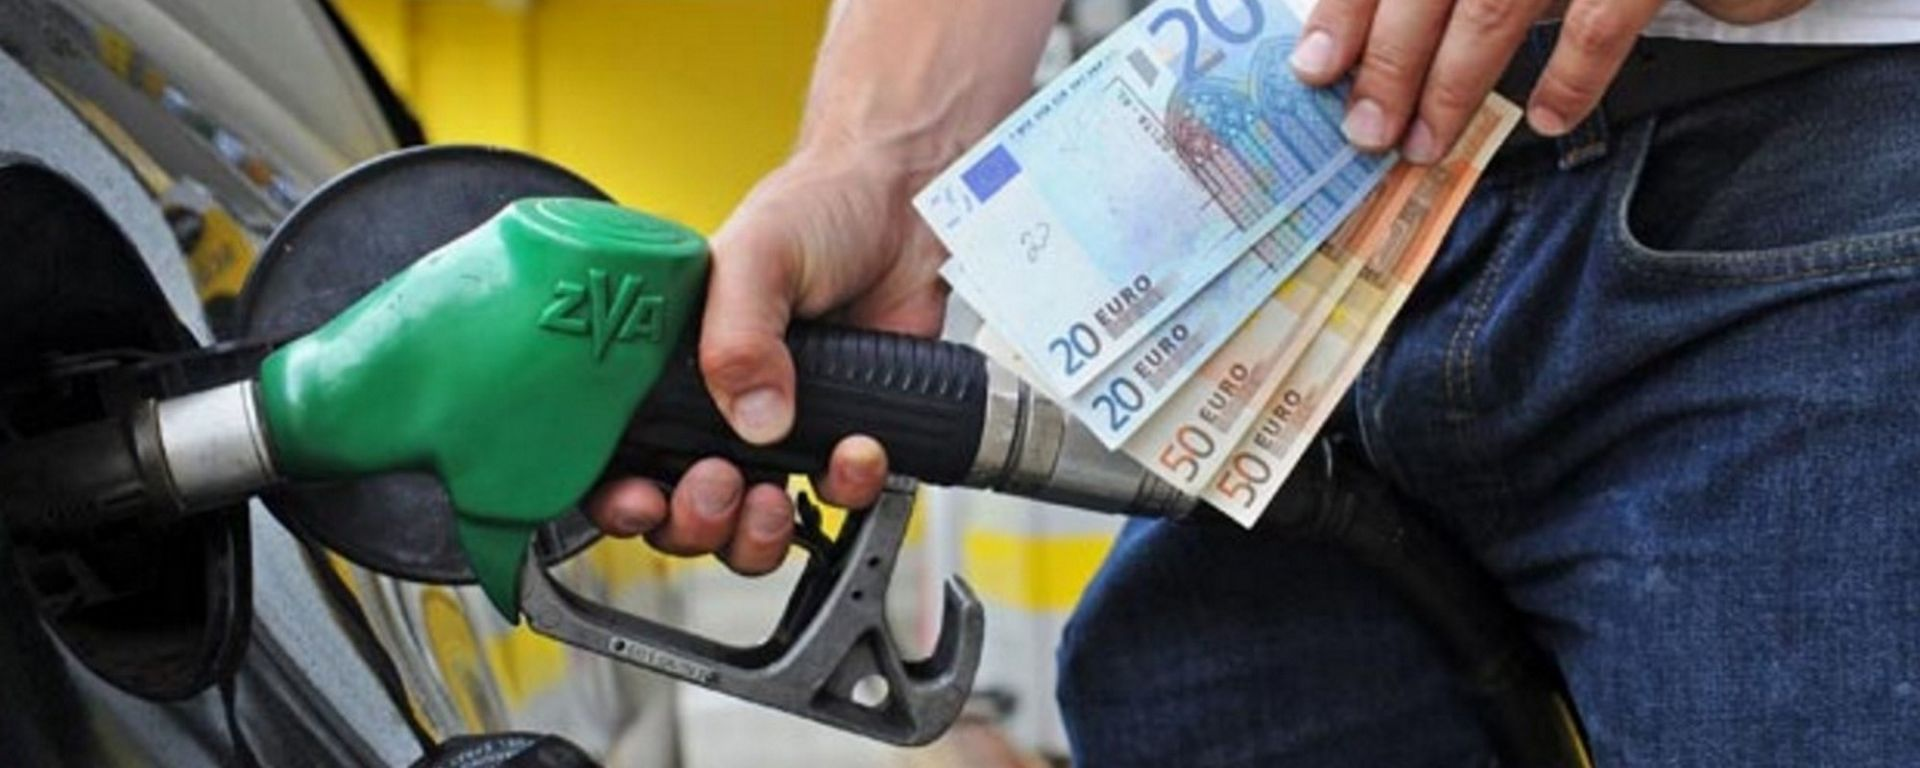 Cara benzina, quanto mi costi